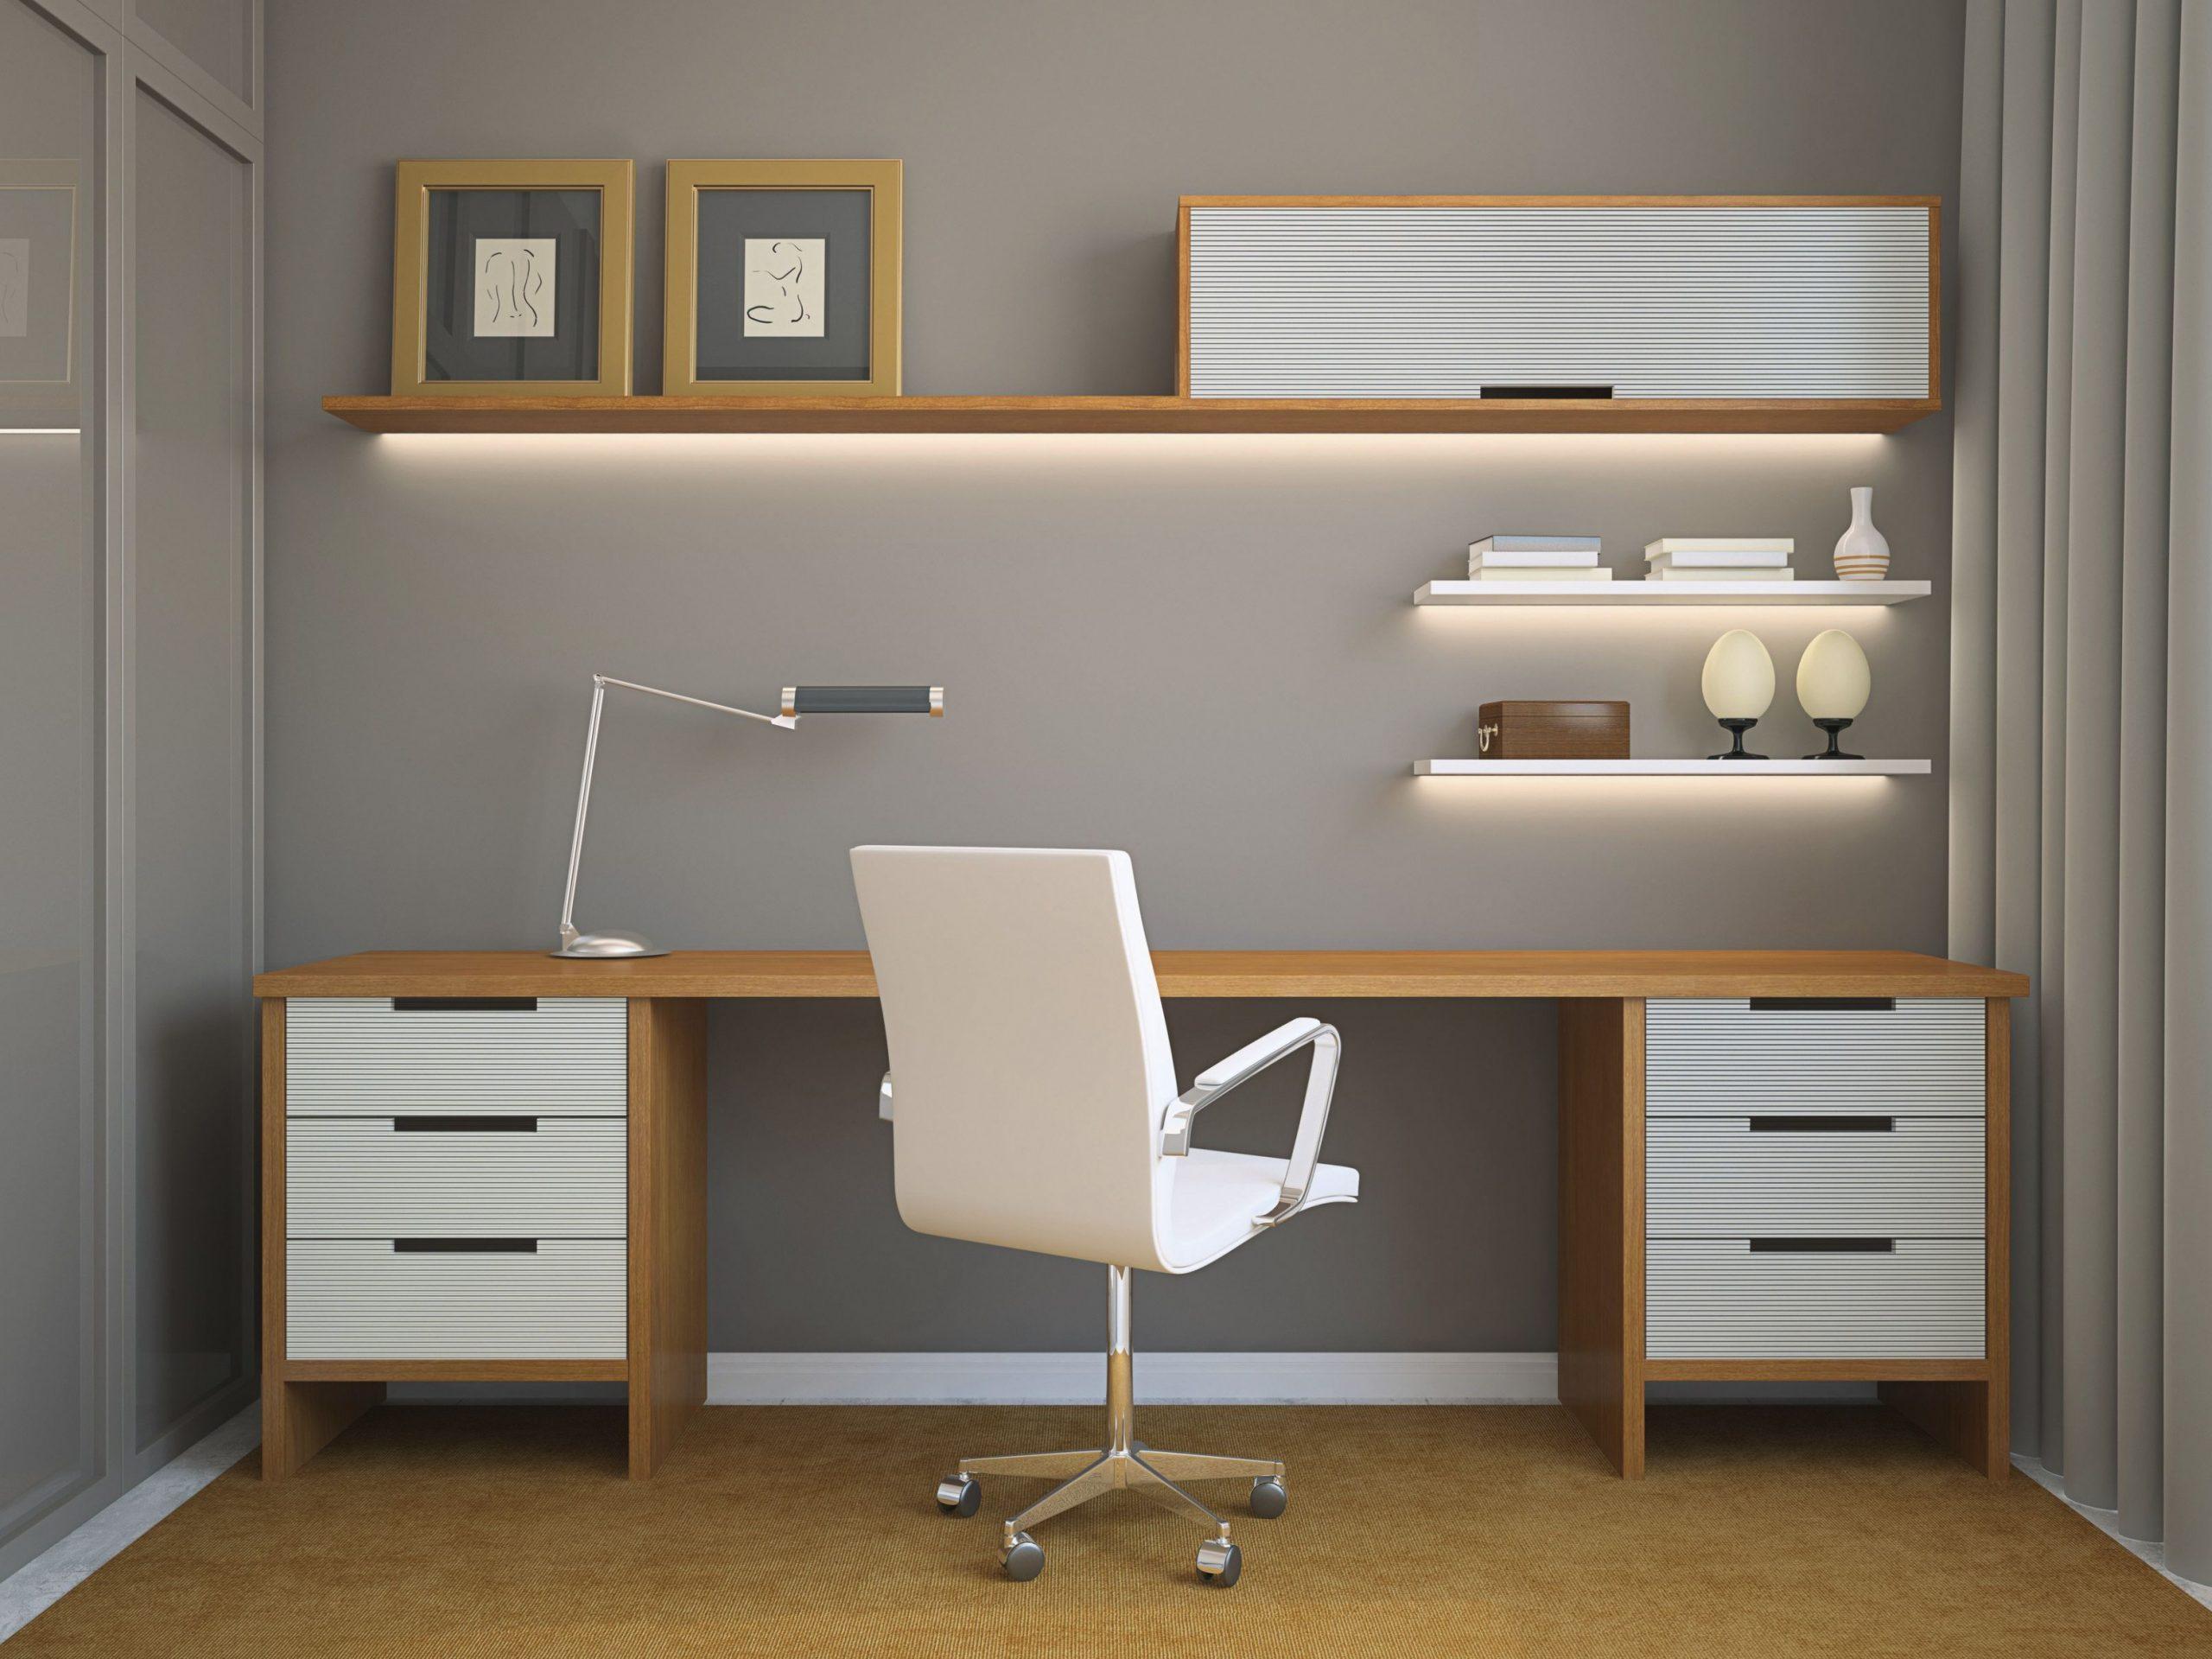 Office Ikea Office Ideas Pinterest Small Interior Design Pictures  - Home Office Ideas Pinterest